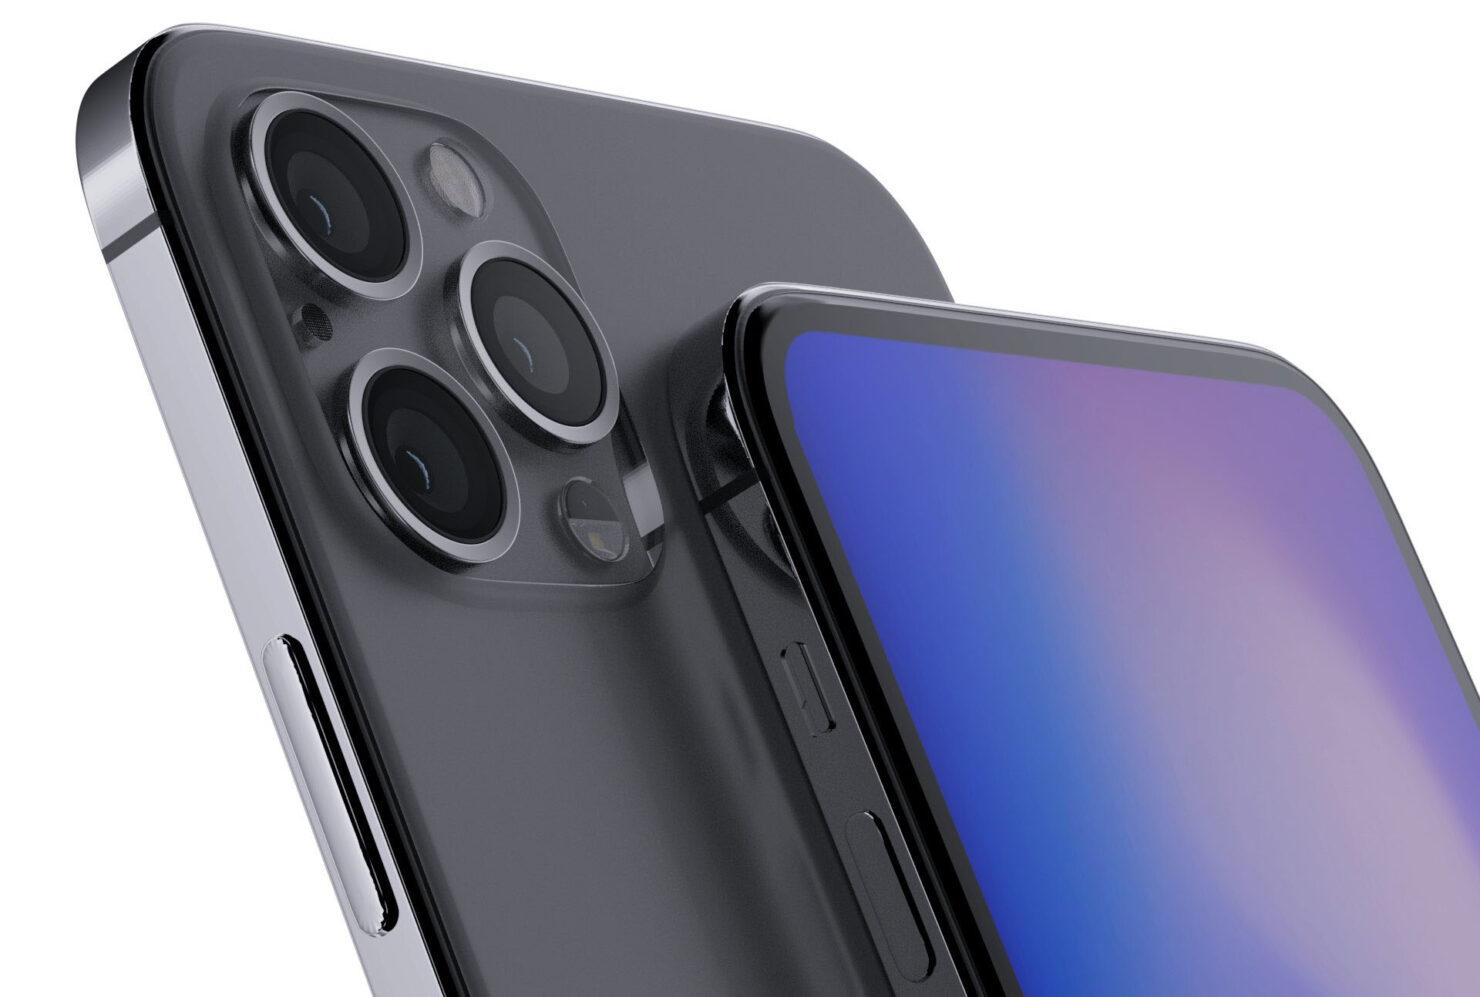 Rumored Apple iPhone 13 prototype reveals redesigned camera looks